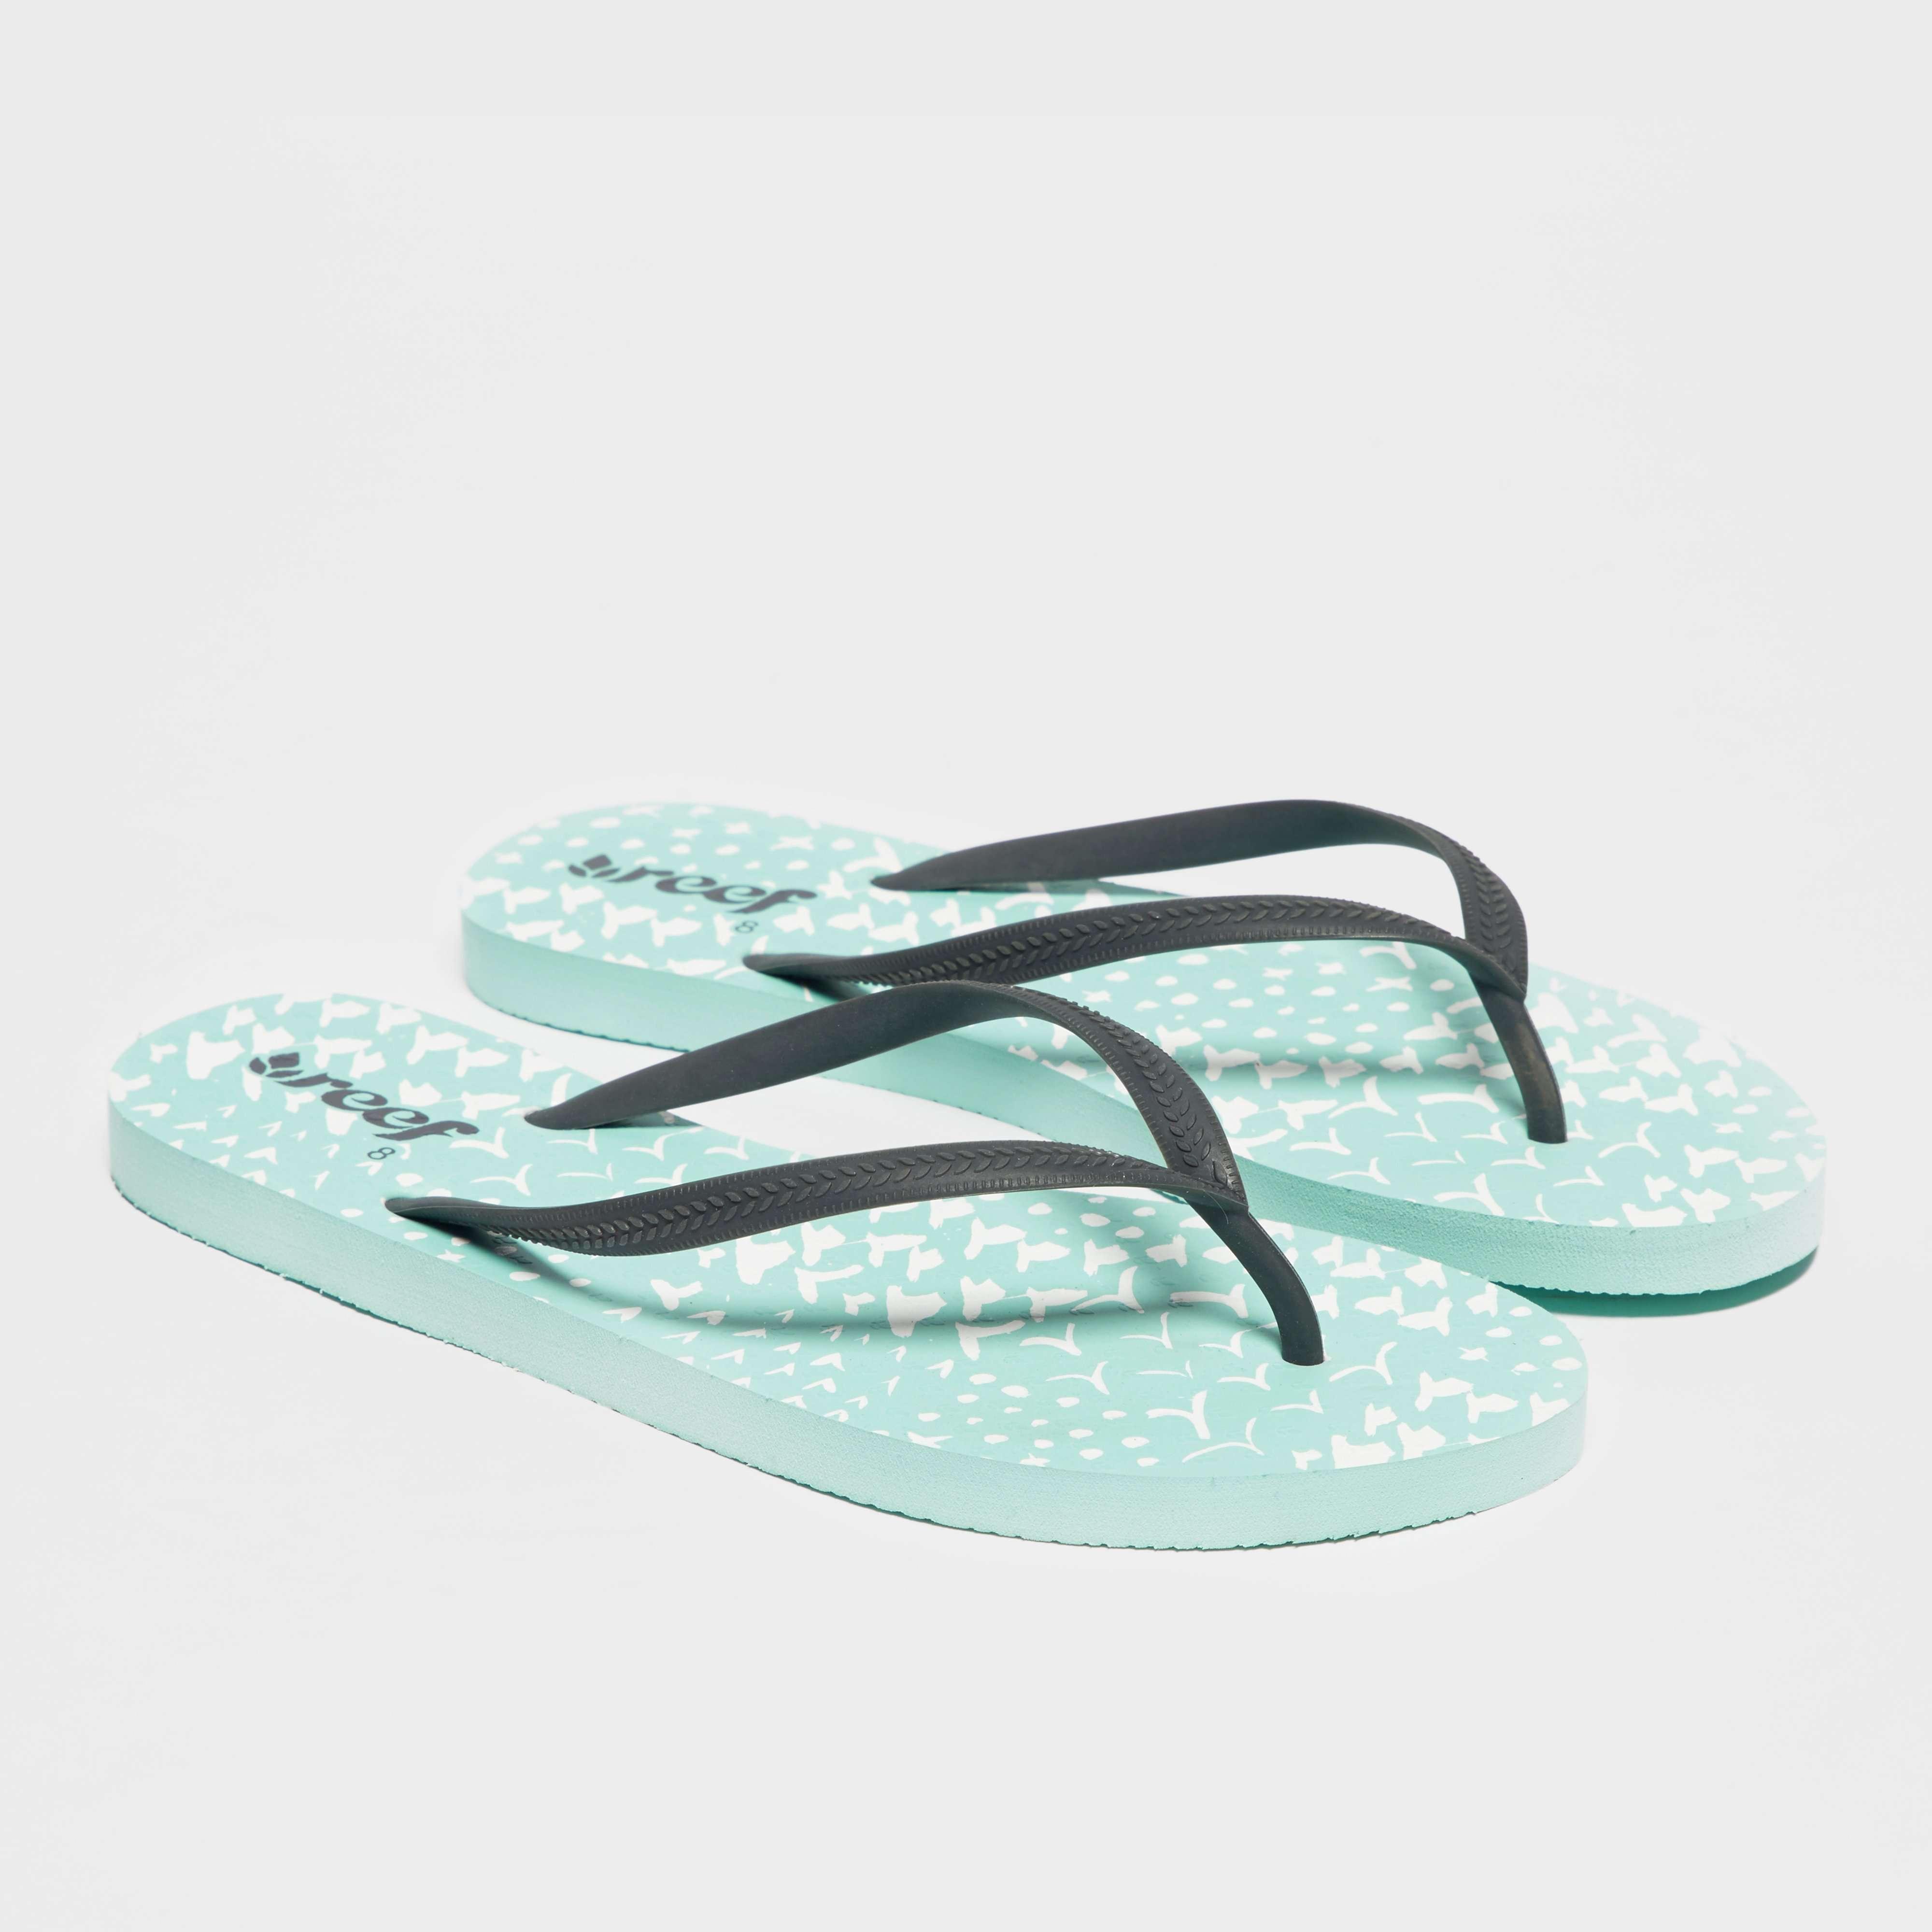 REEF Women's Chakras Aqua Flip Flop